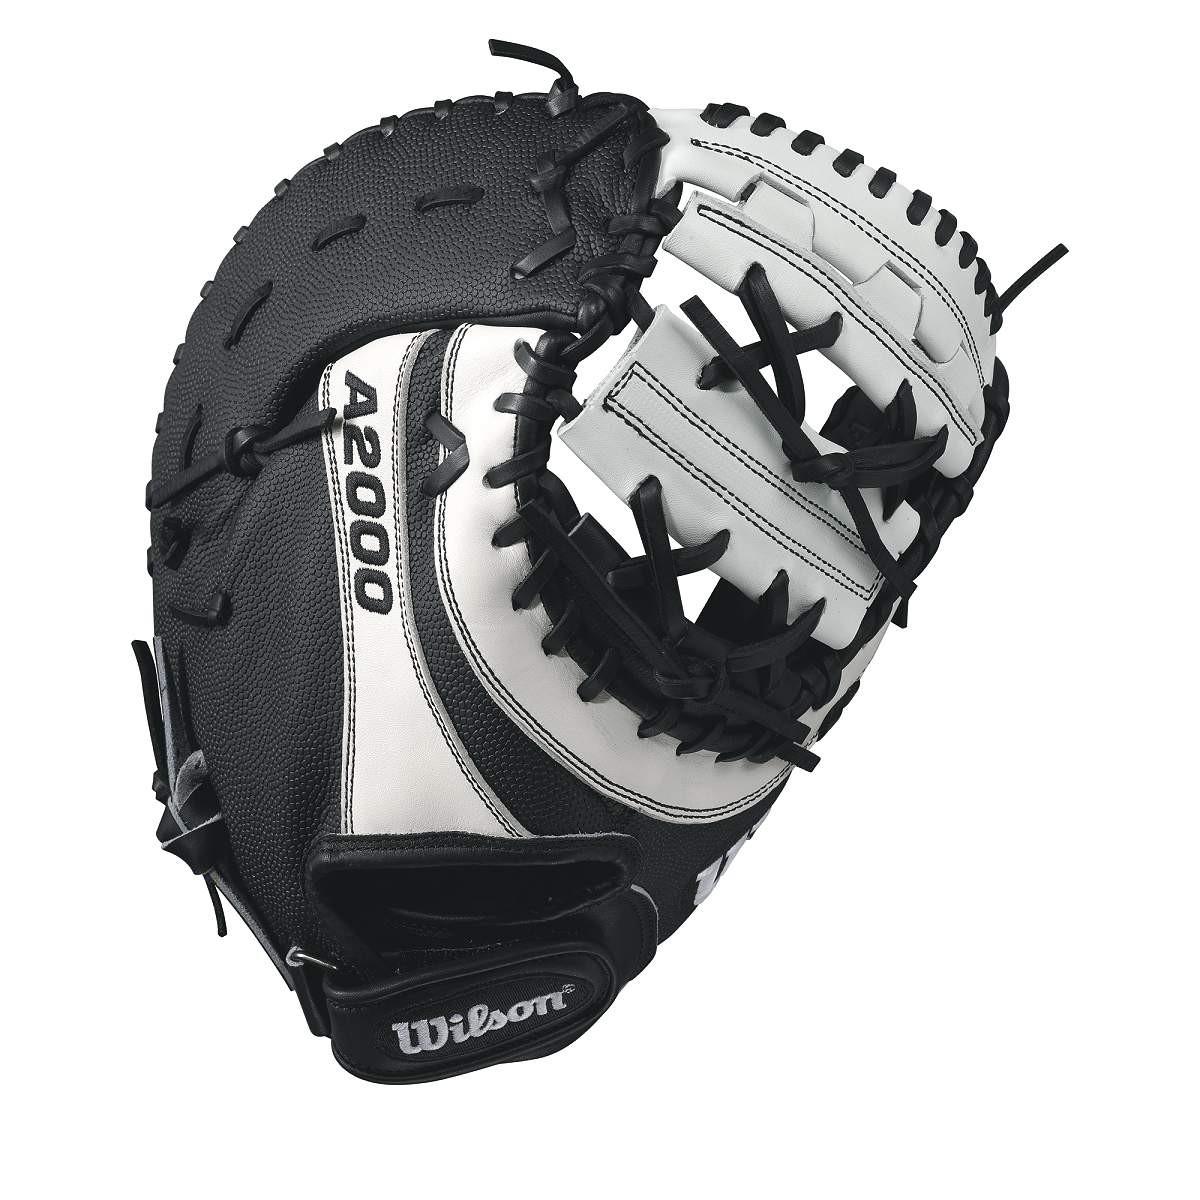 wilson-a2000-bm12-superskin-fastpitch-glove-blackwhite-12-left-hand-throw A20LF17BM12SS-LeftHandThrow Wilson 887768499518 The Wilson A2000 BM12 SS fastpitch first base mitt was designed